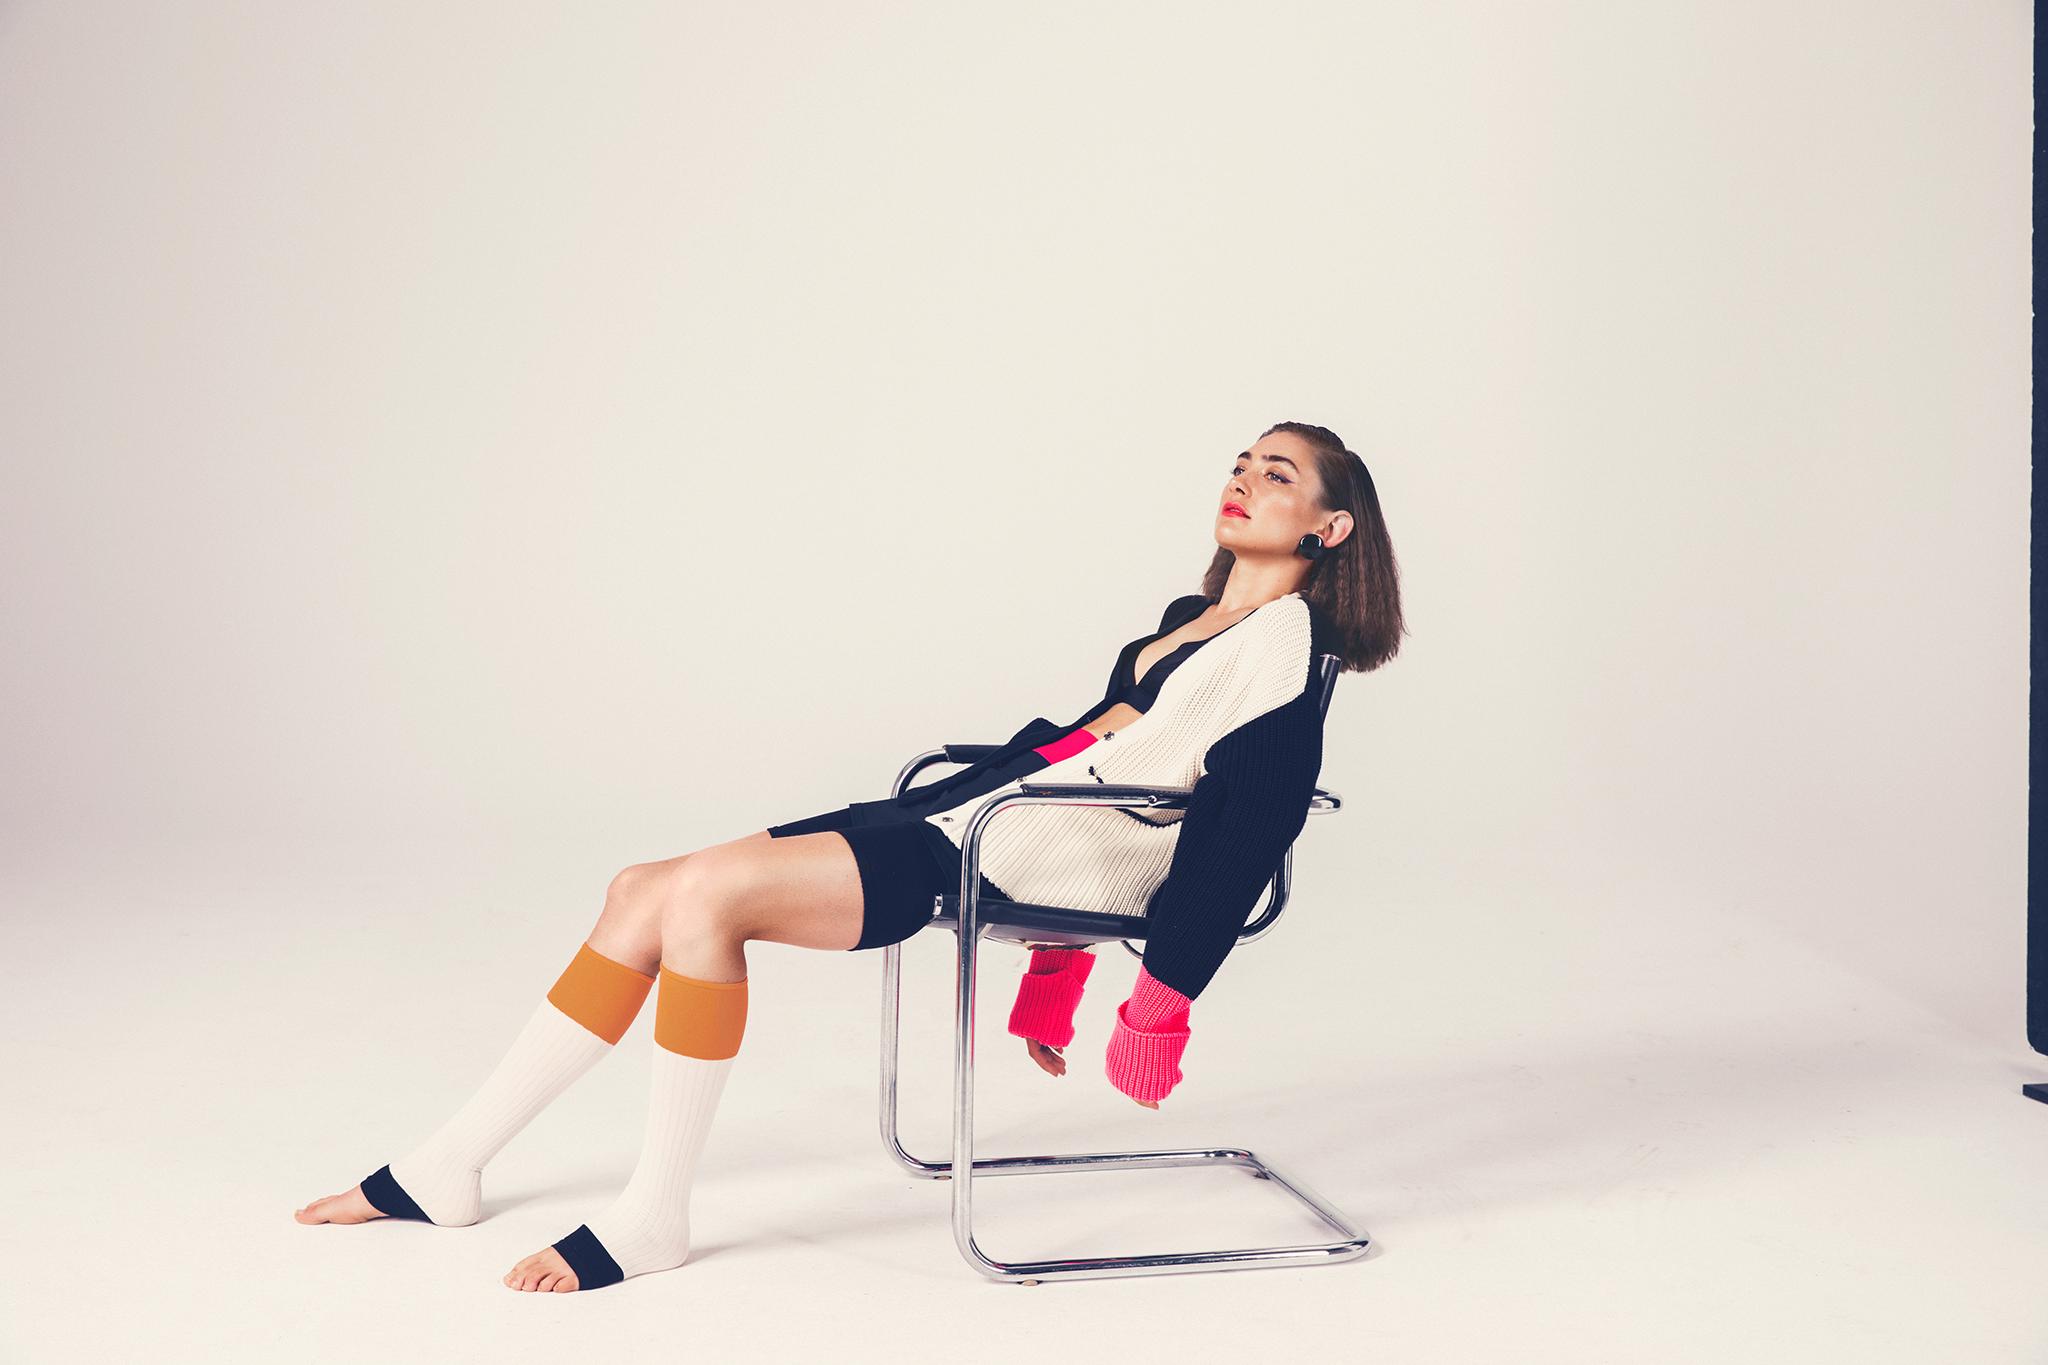 bauhaus_valentin_muehl_fotograf_studio_werbefotograf_mode_fashion_duesseldorf_6